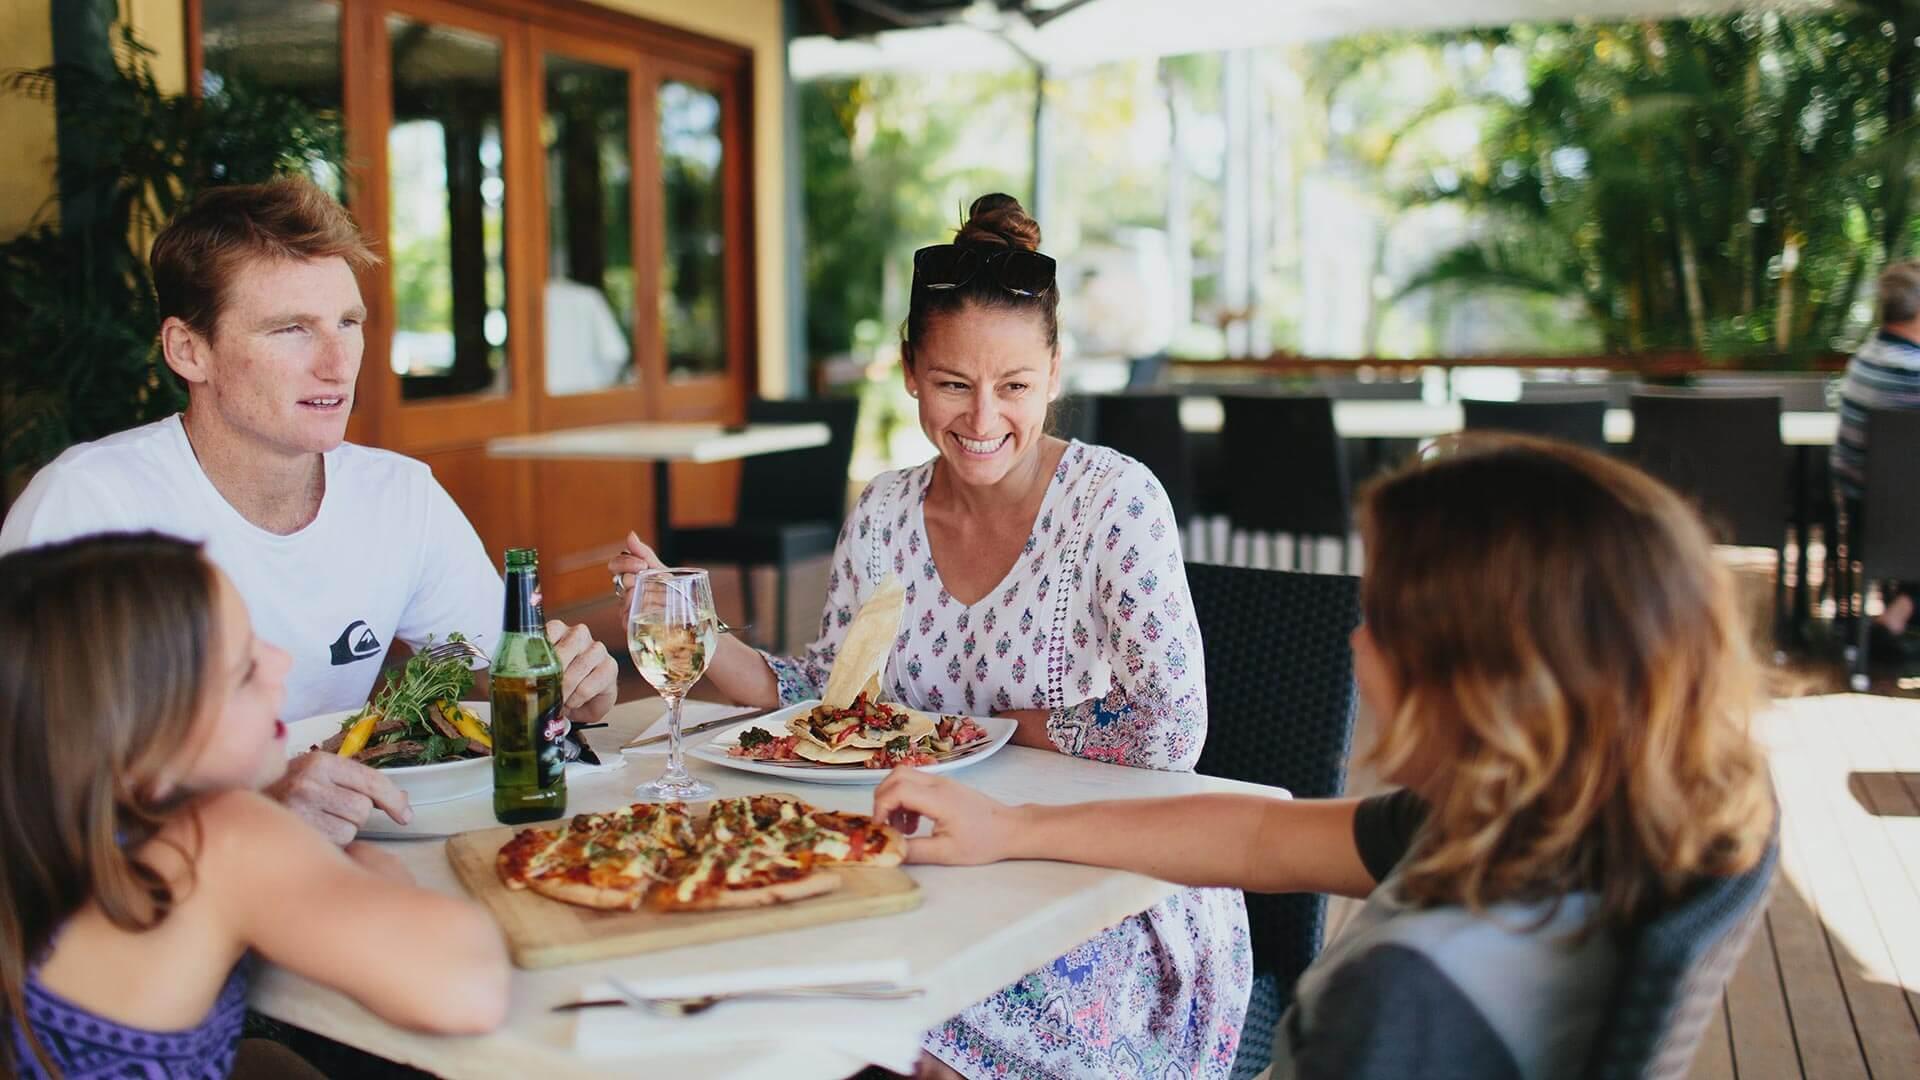 Dinner time at NRMA Treasure Island Holiday Park